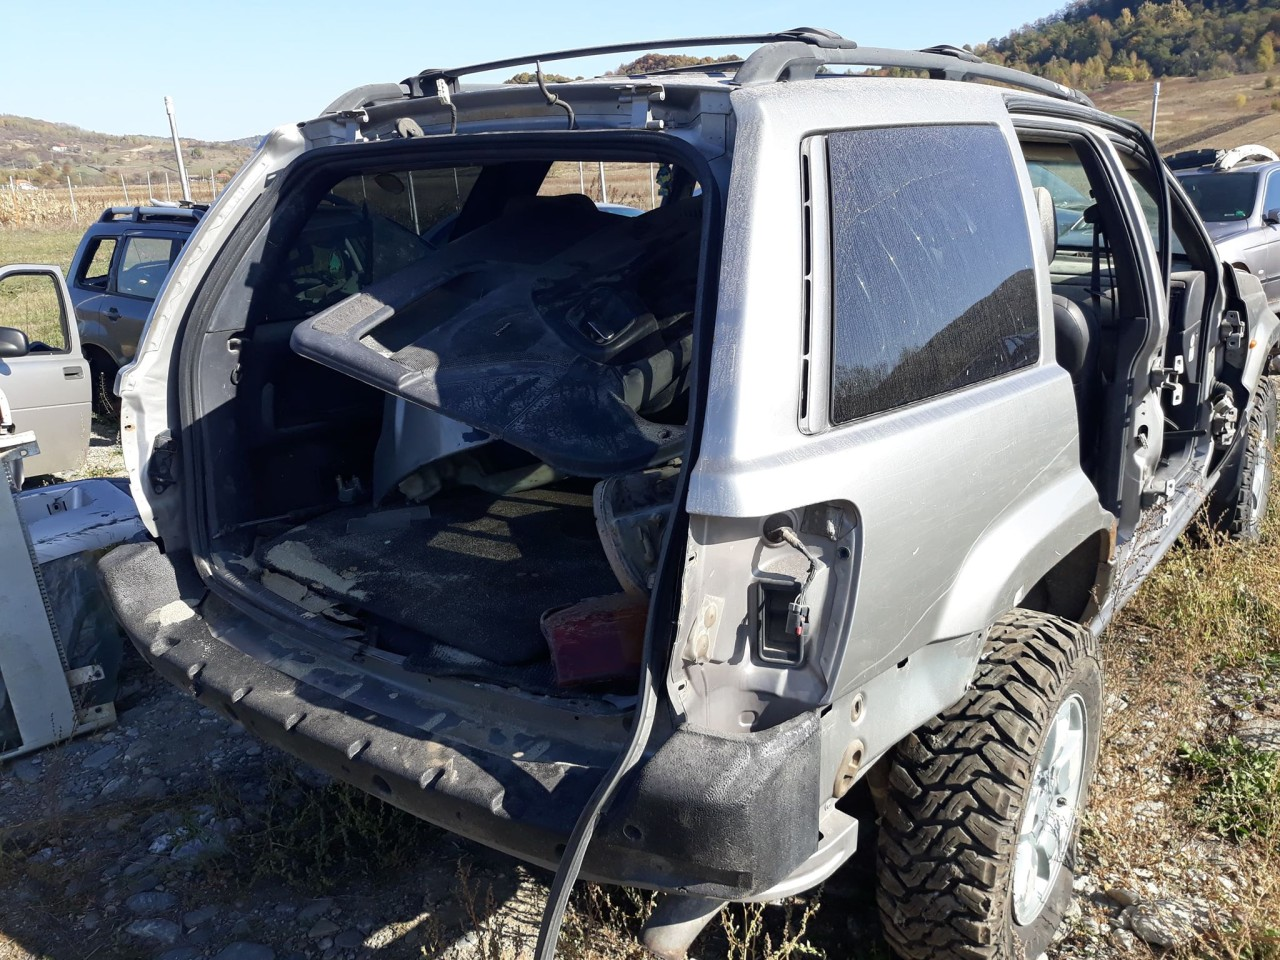 dezmembrari dezmembrez jeep grand cherokee an 2001 motor 3.1 diesel